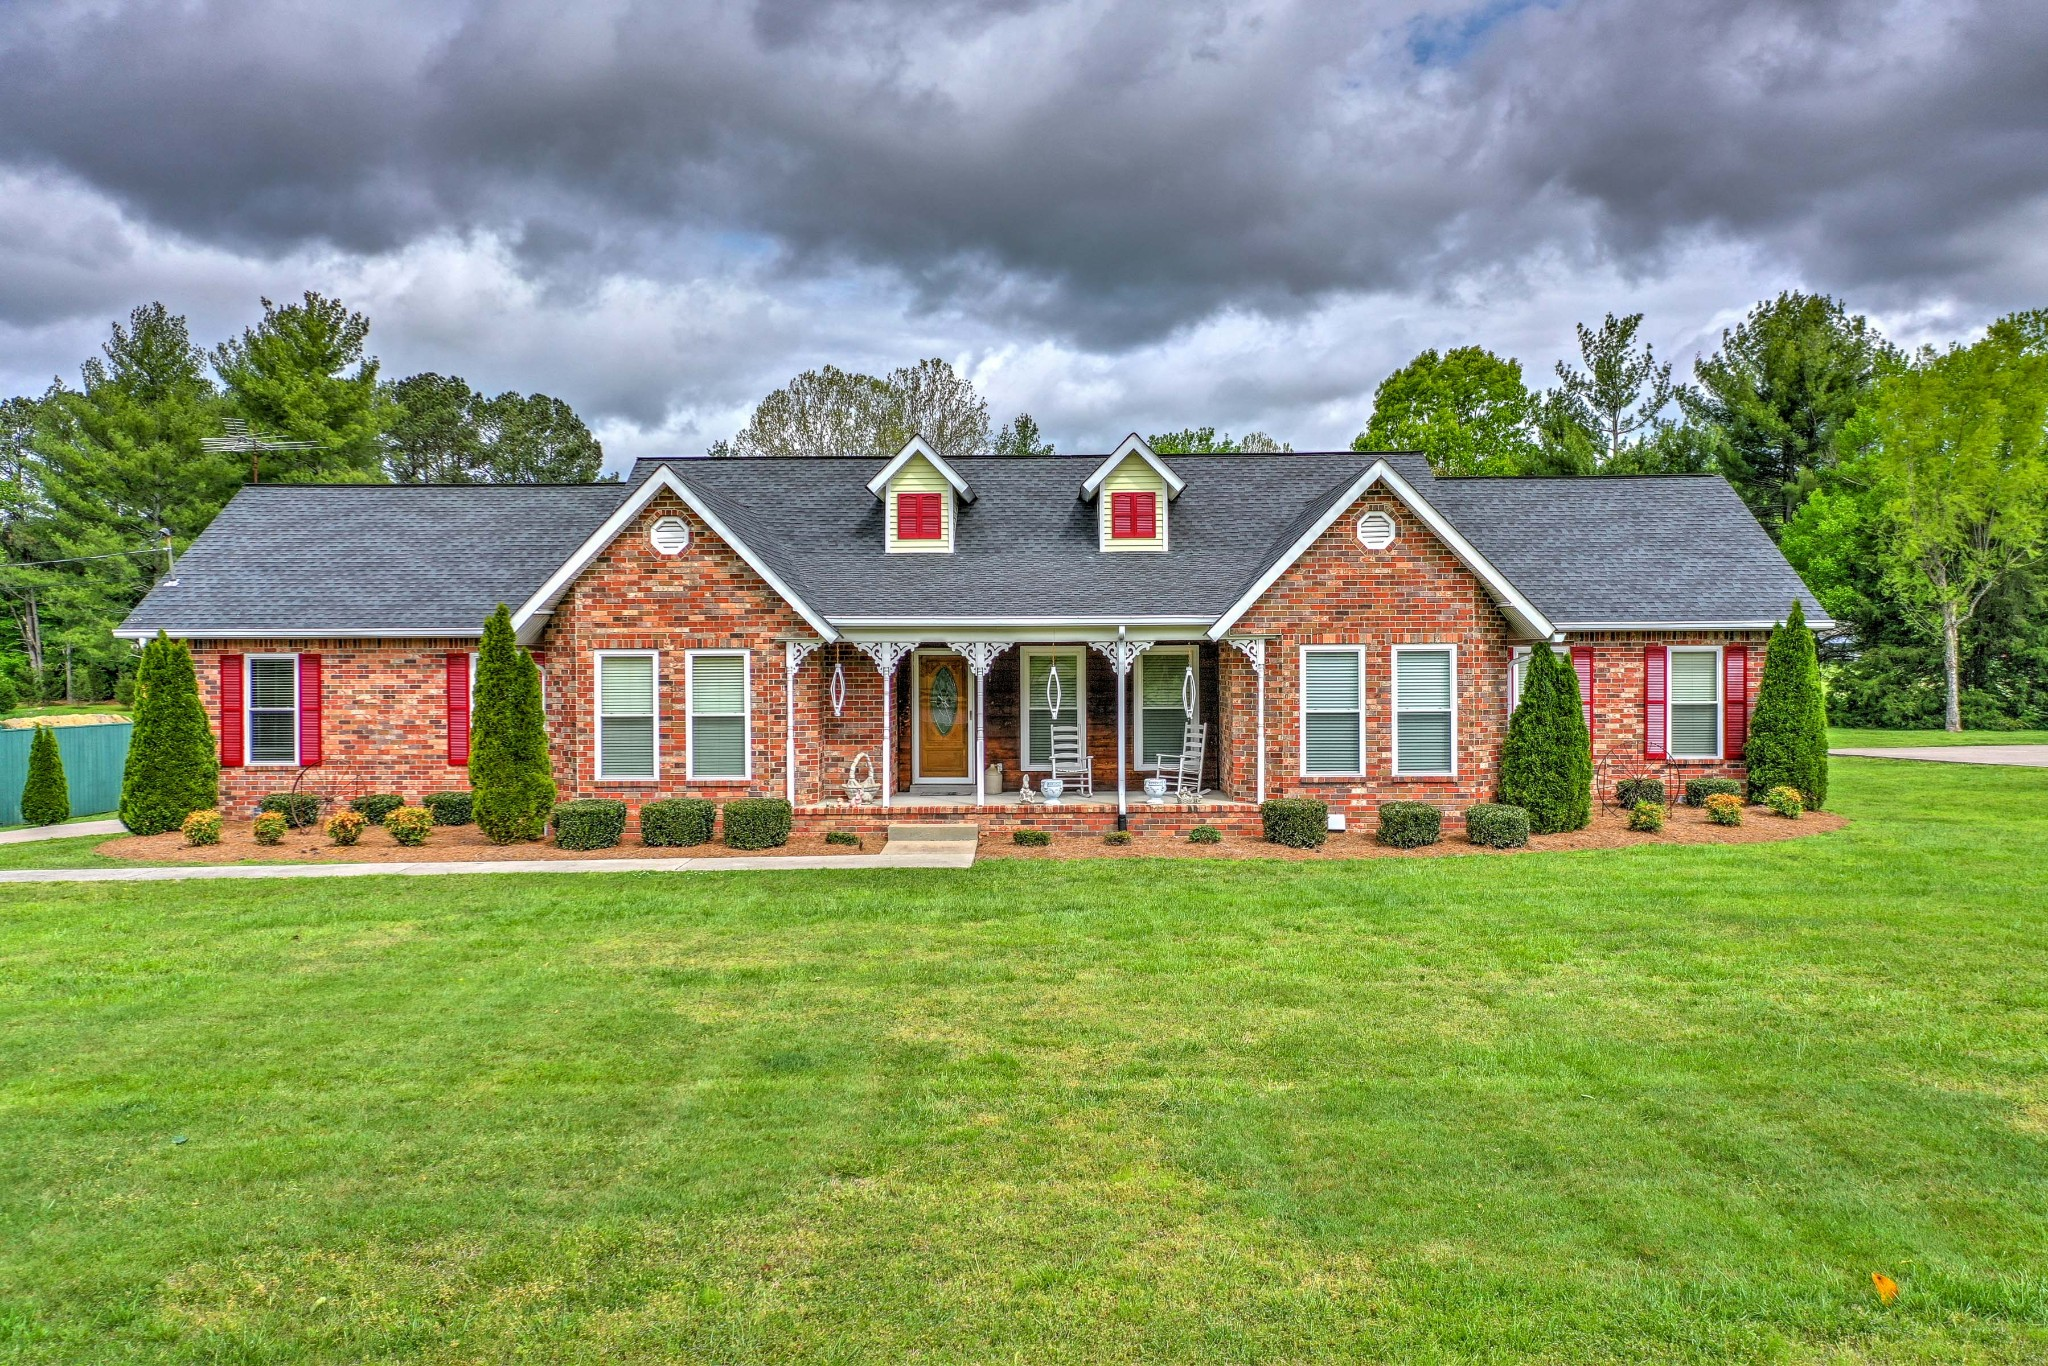 2658 Union Hill Rd, Joelton, TN 37080 - Joelton, TN real estate listing